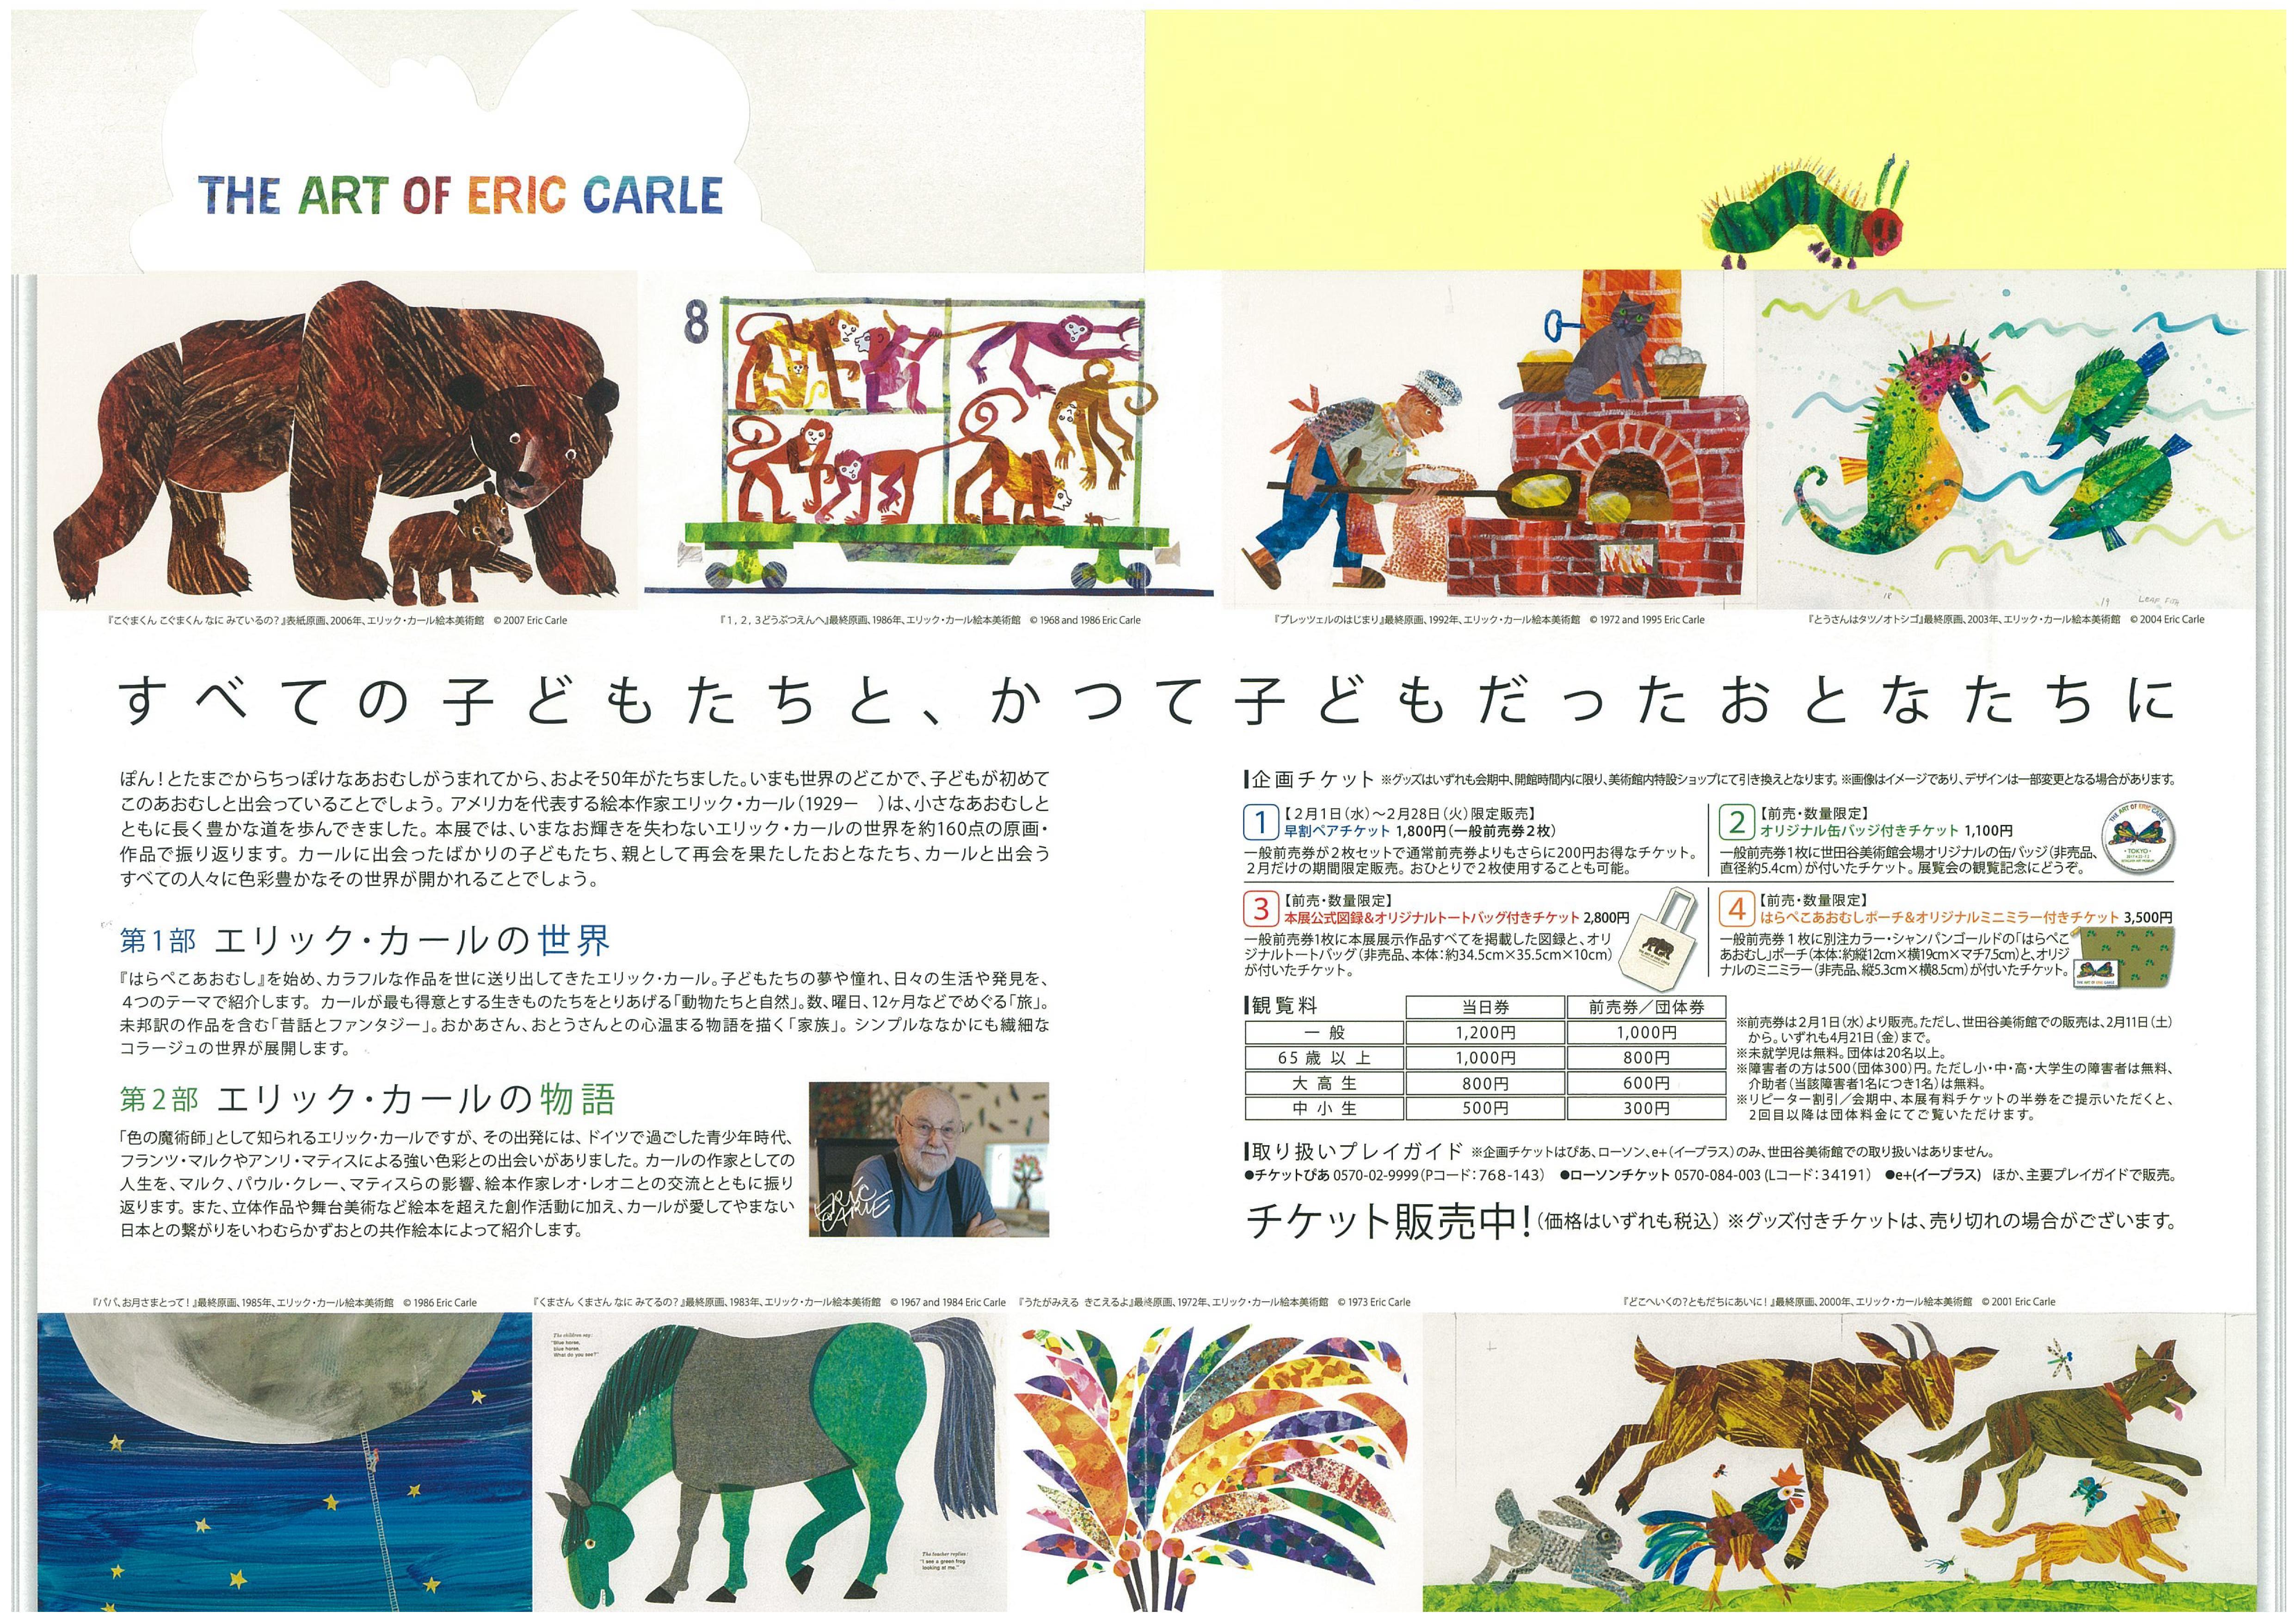 http://www.yamanoestate.co.jp/wordpress/wp-content/uploads/693c9fe755649037c2e768e354b3c629.jpg